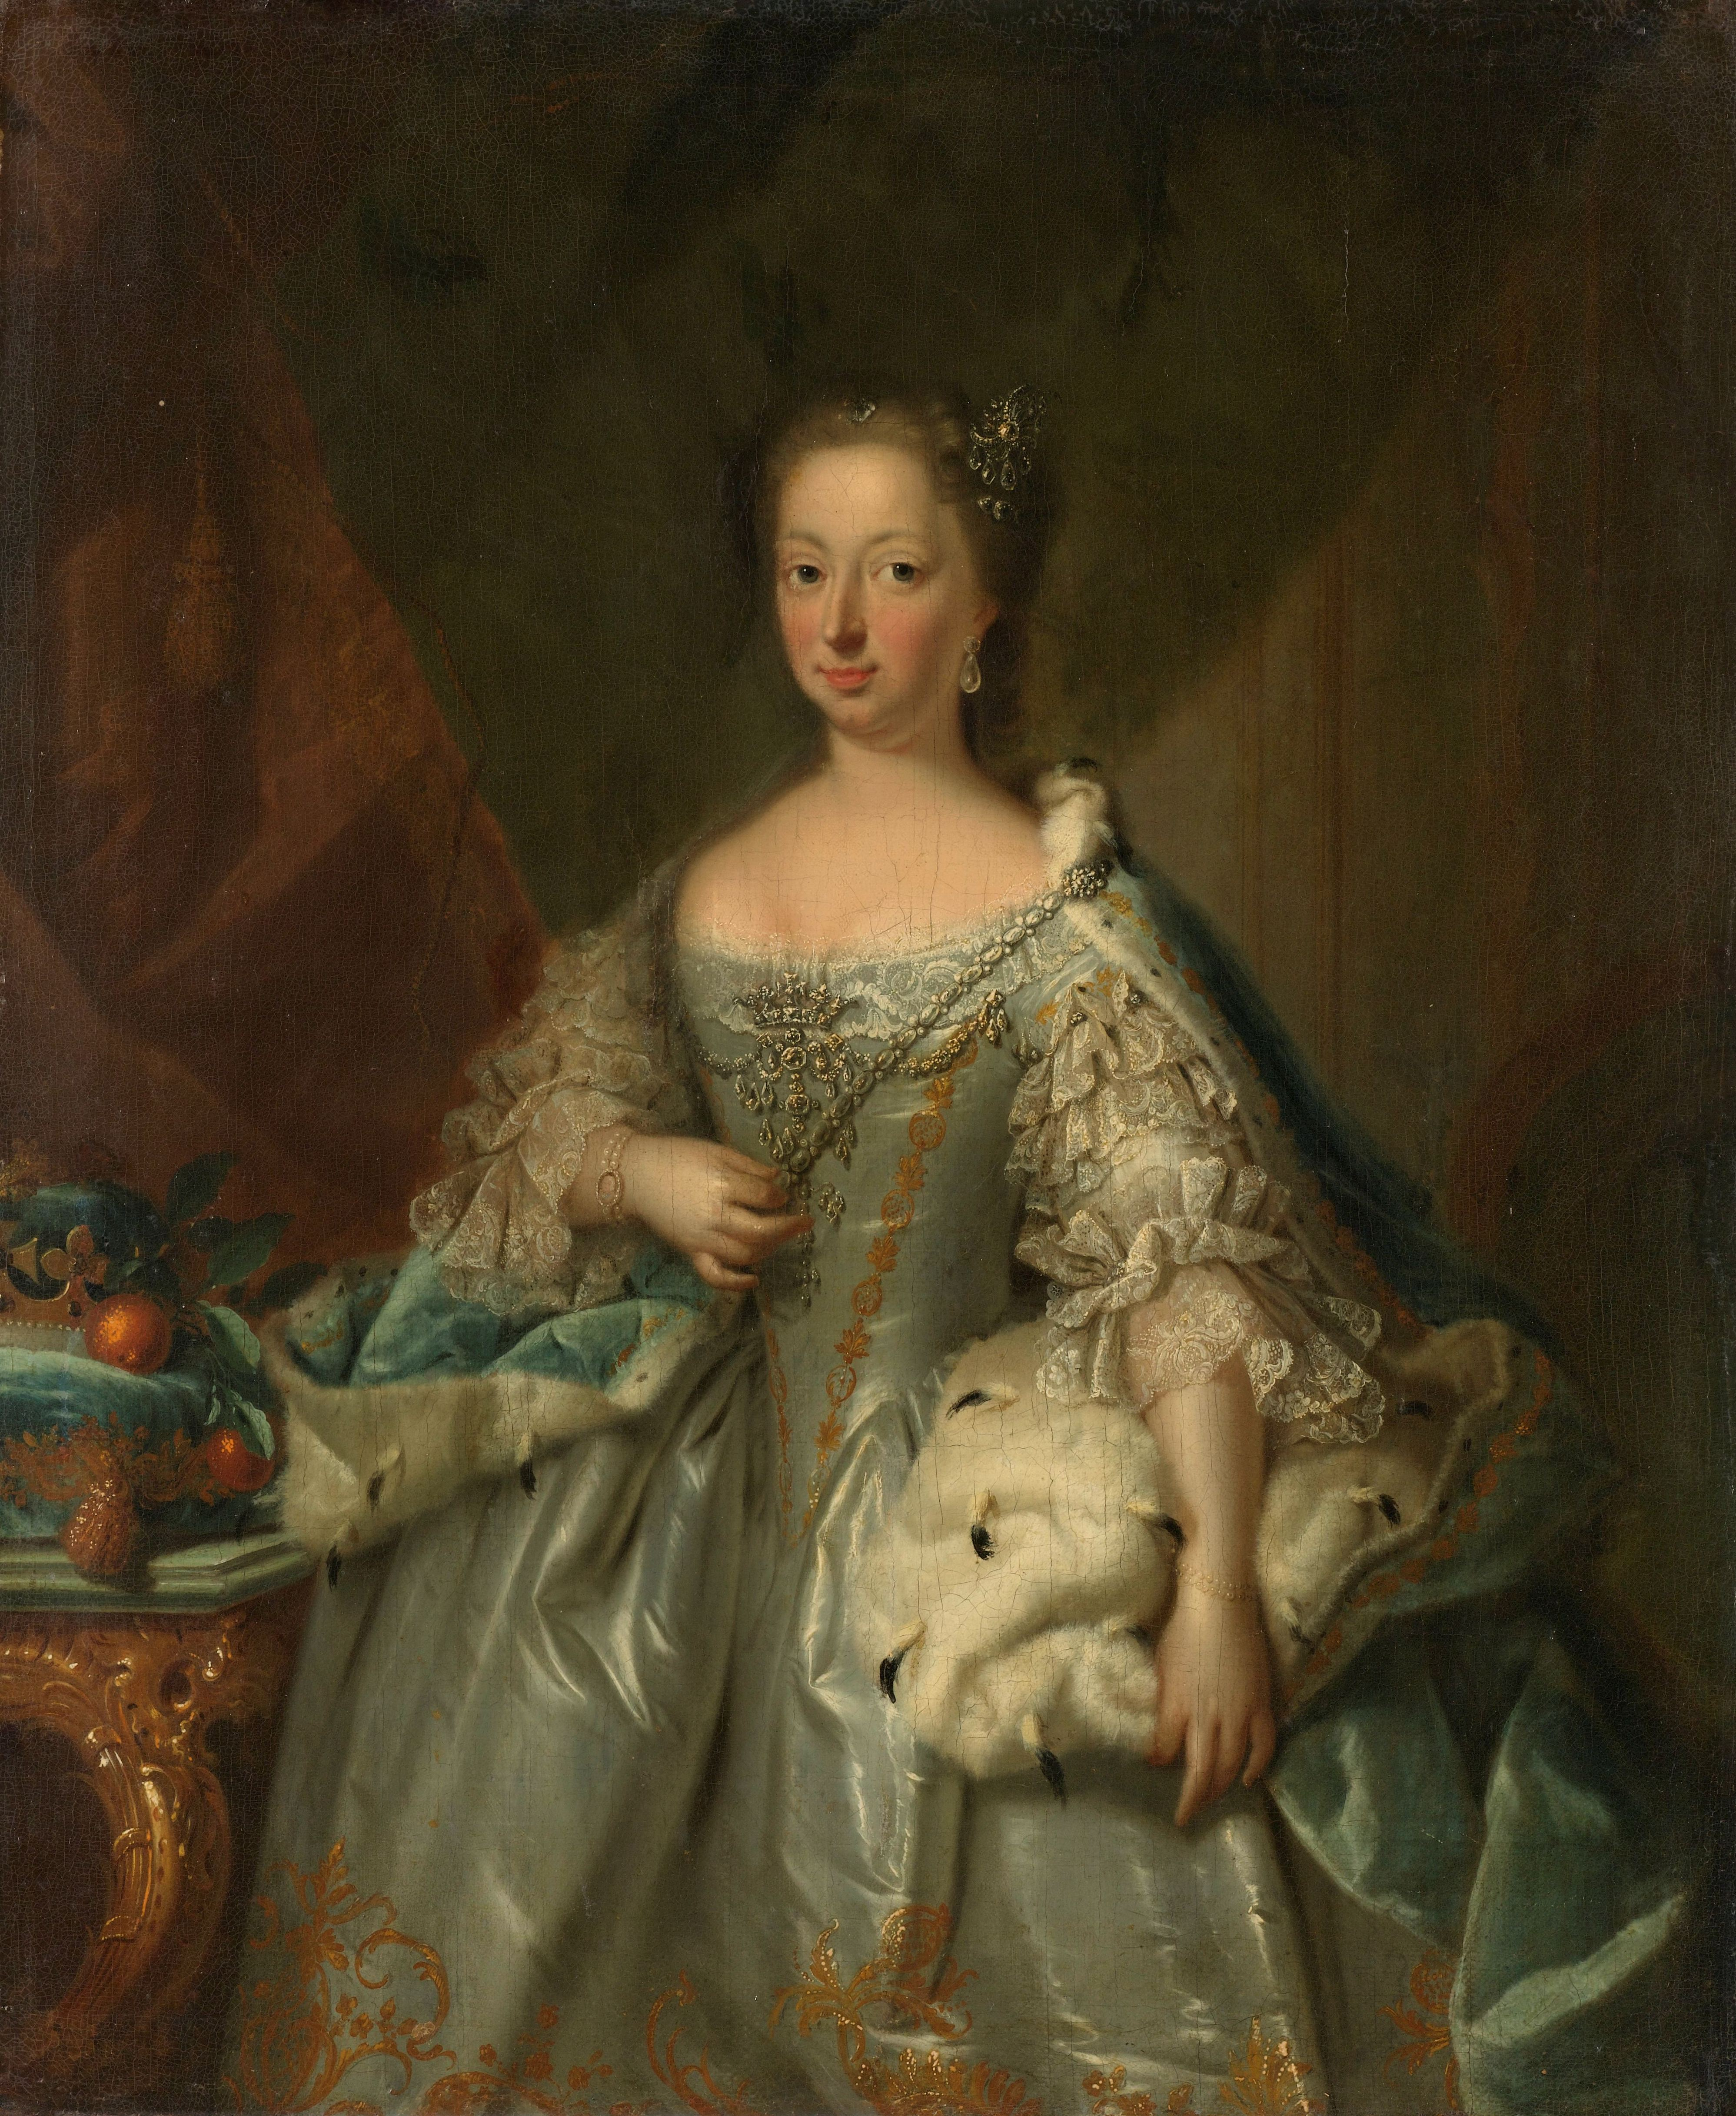 Afb. 1: Portret van Anna van Hannover, J.V. Tischbein, 1753. Rijksmuseum, Amsterdam.